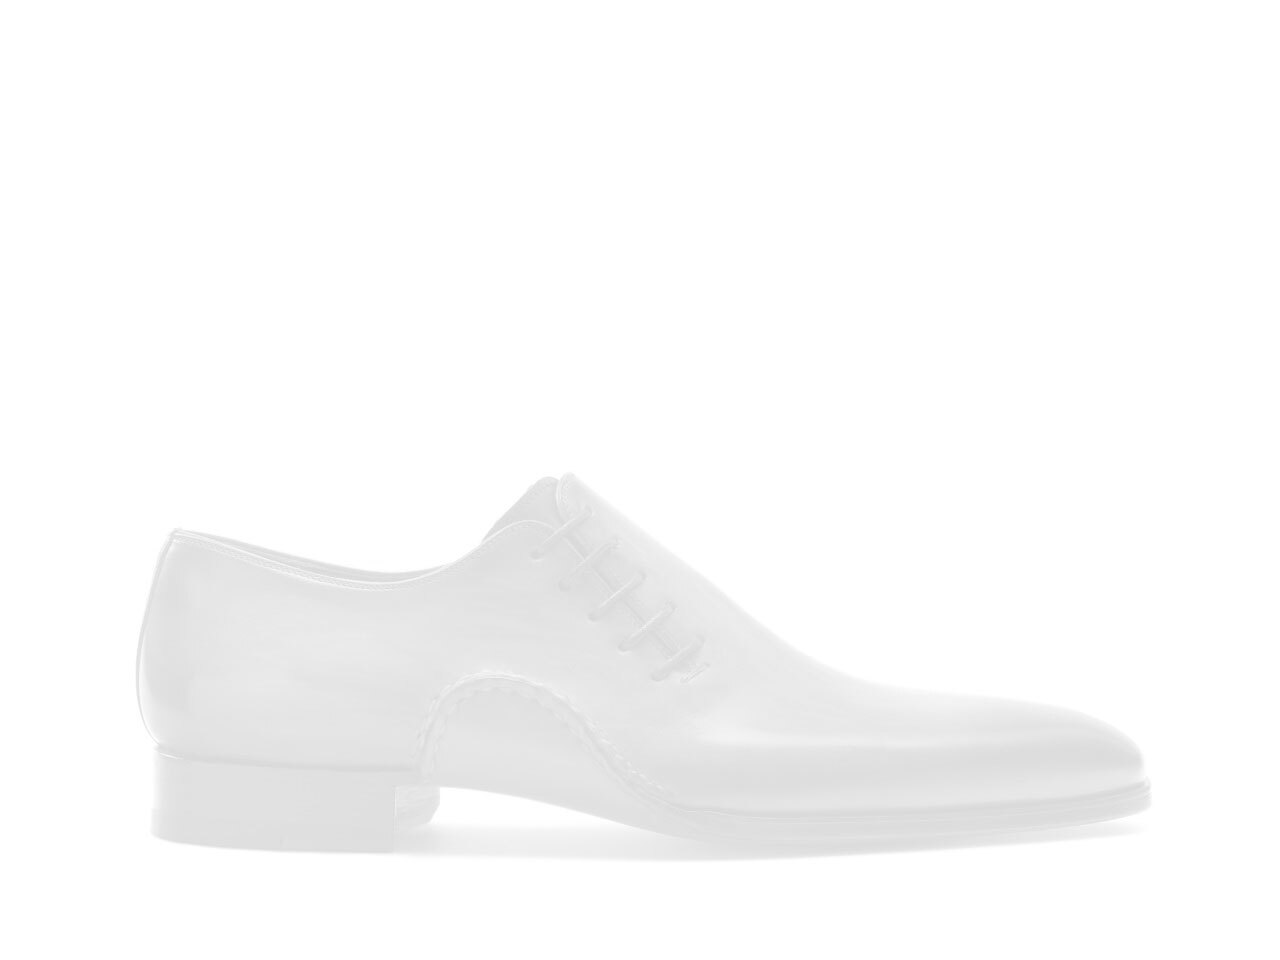 Pair of the Magnanni Heath II Navy Suede Men's Sneakers